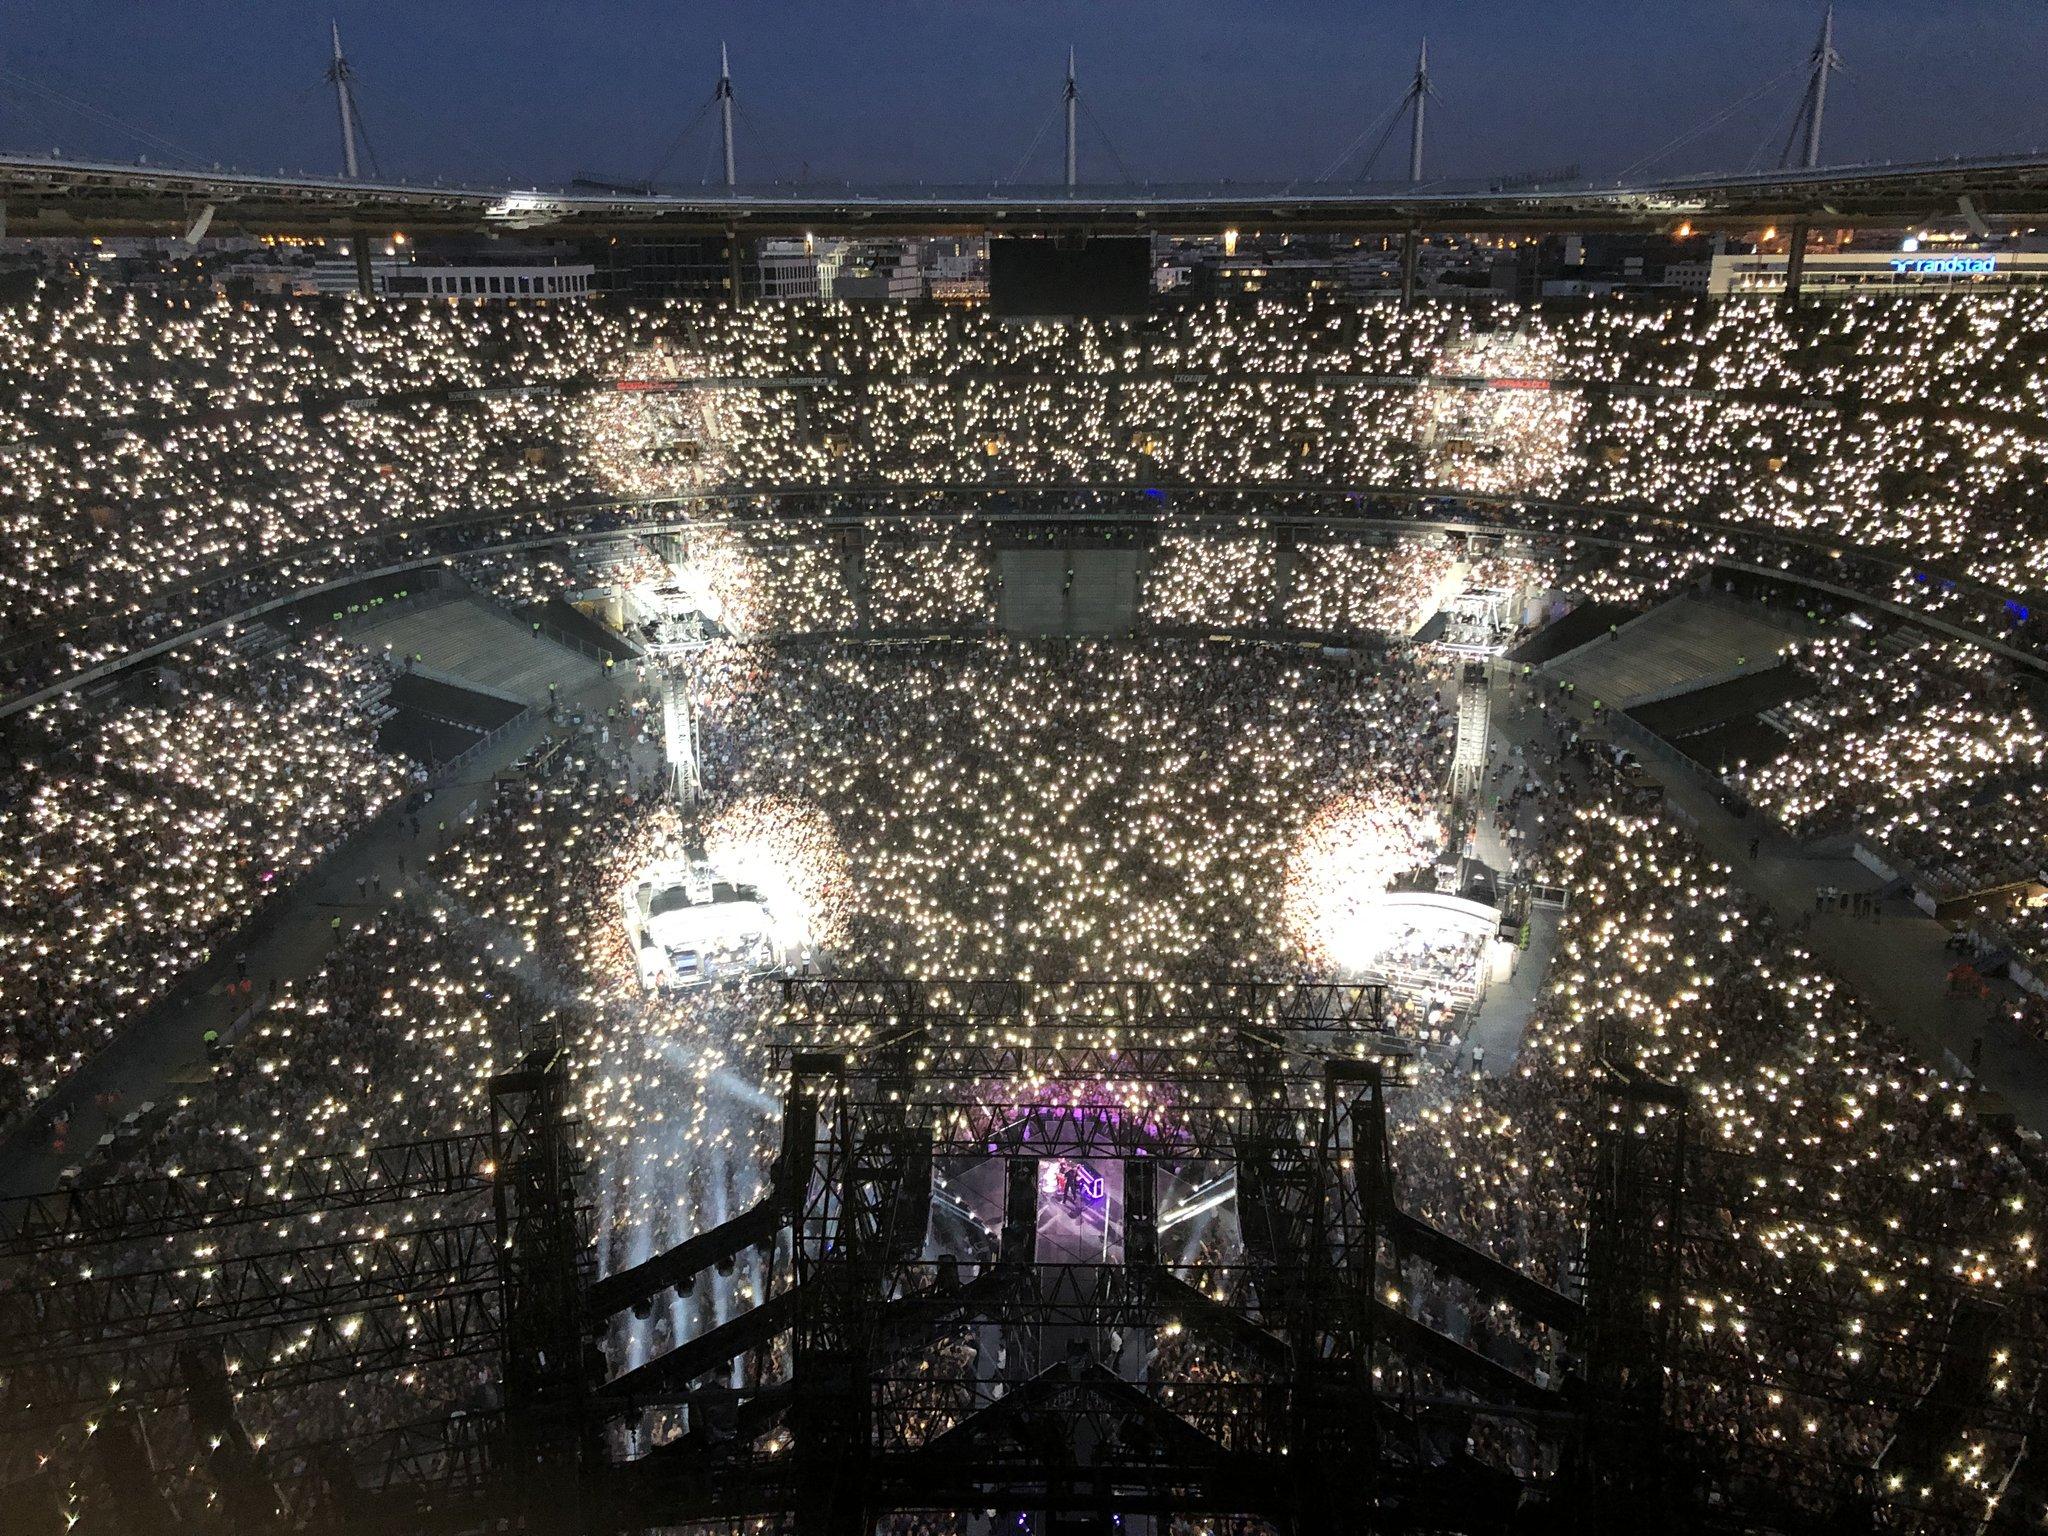 France concert de stade Concerts et